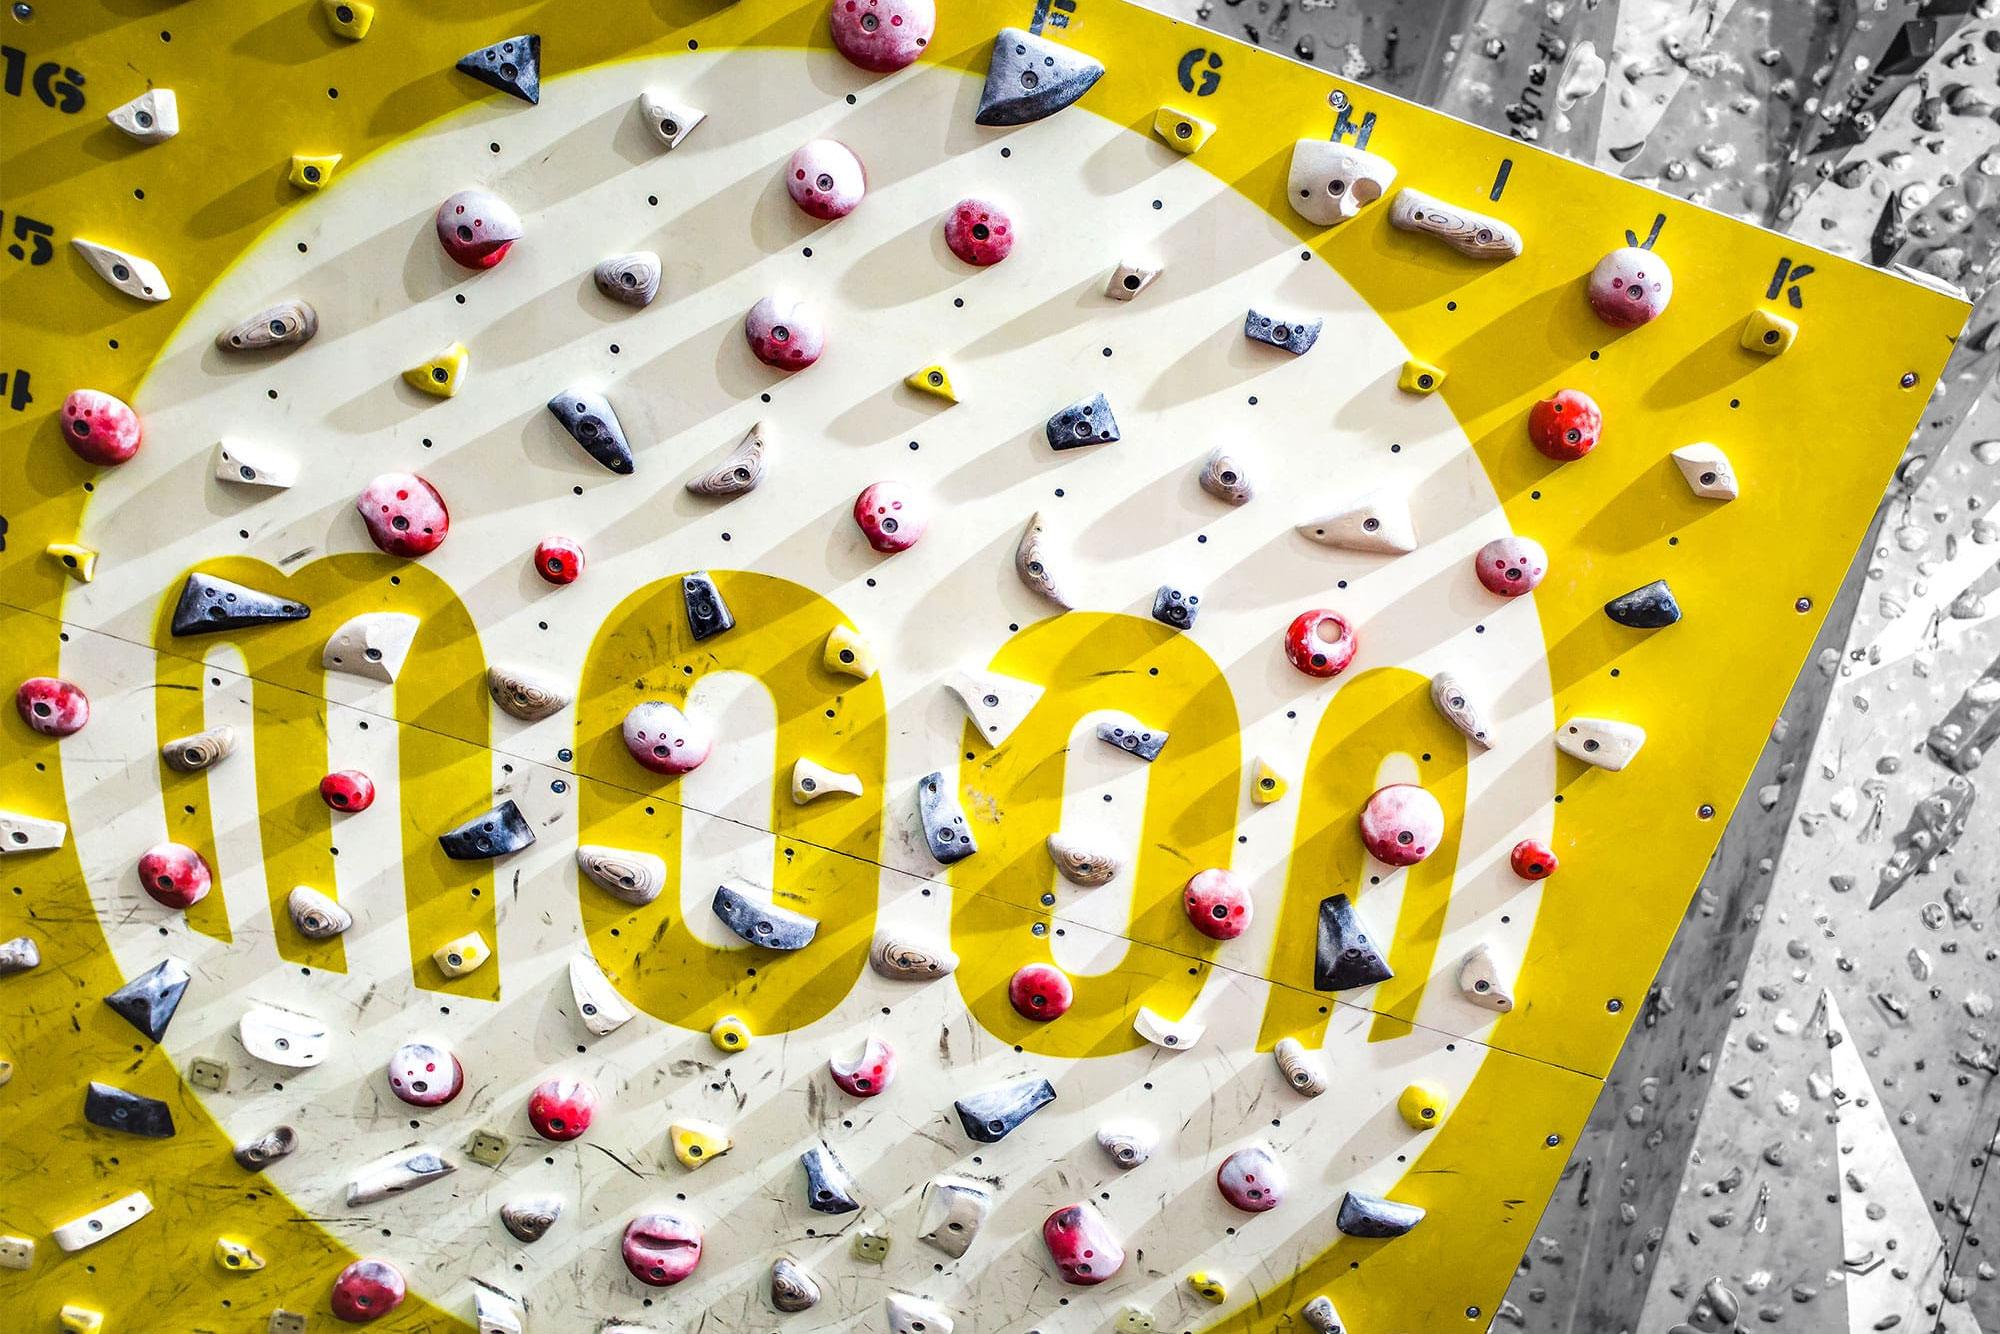 moonboard interactive climbing training board